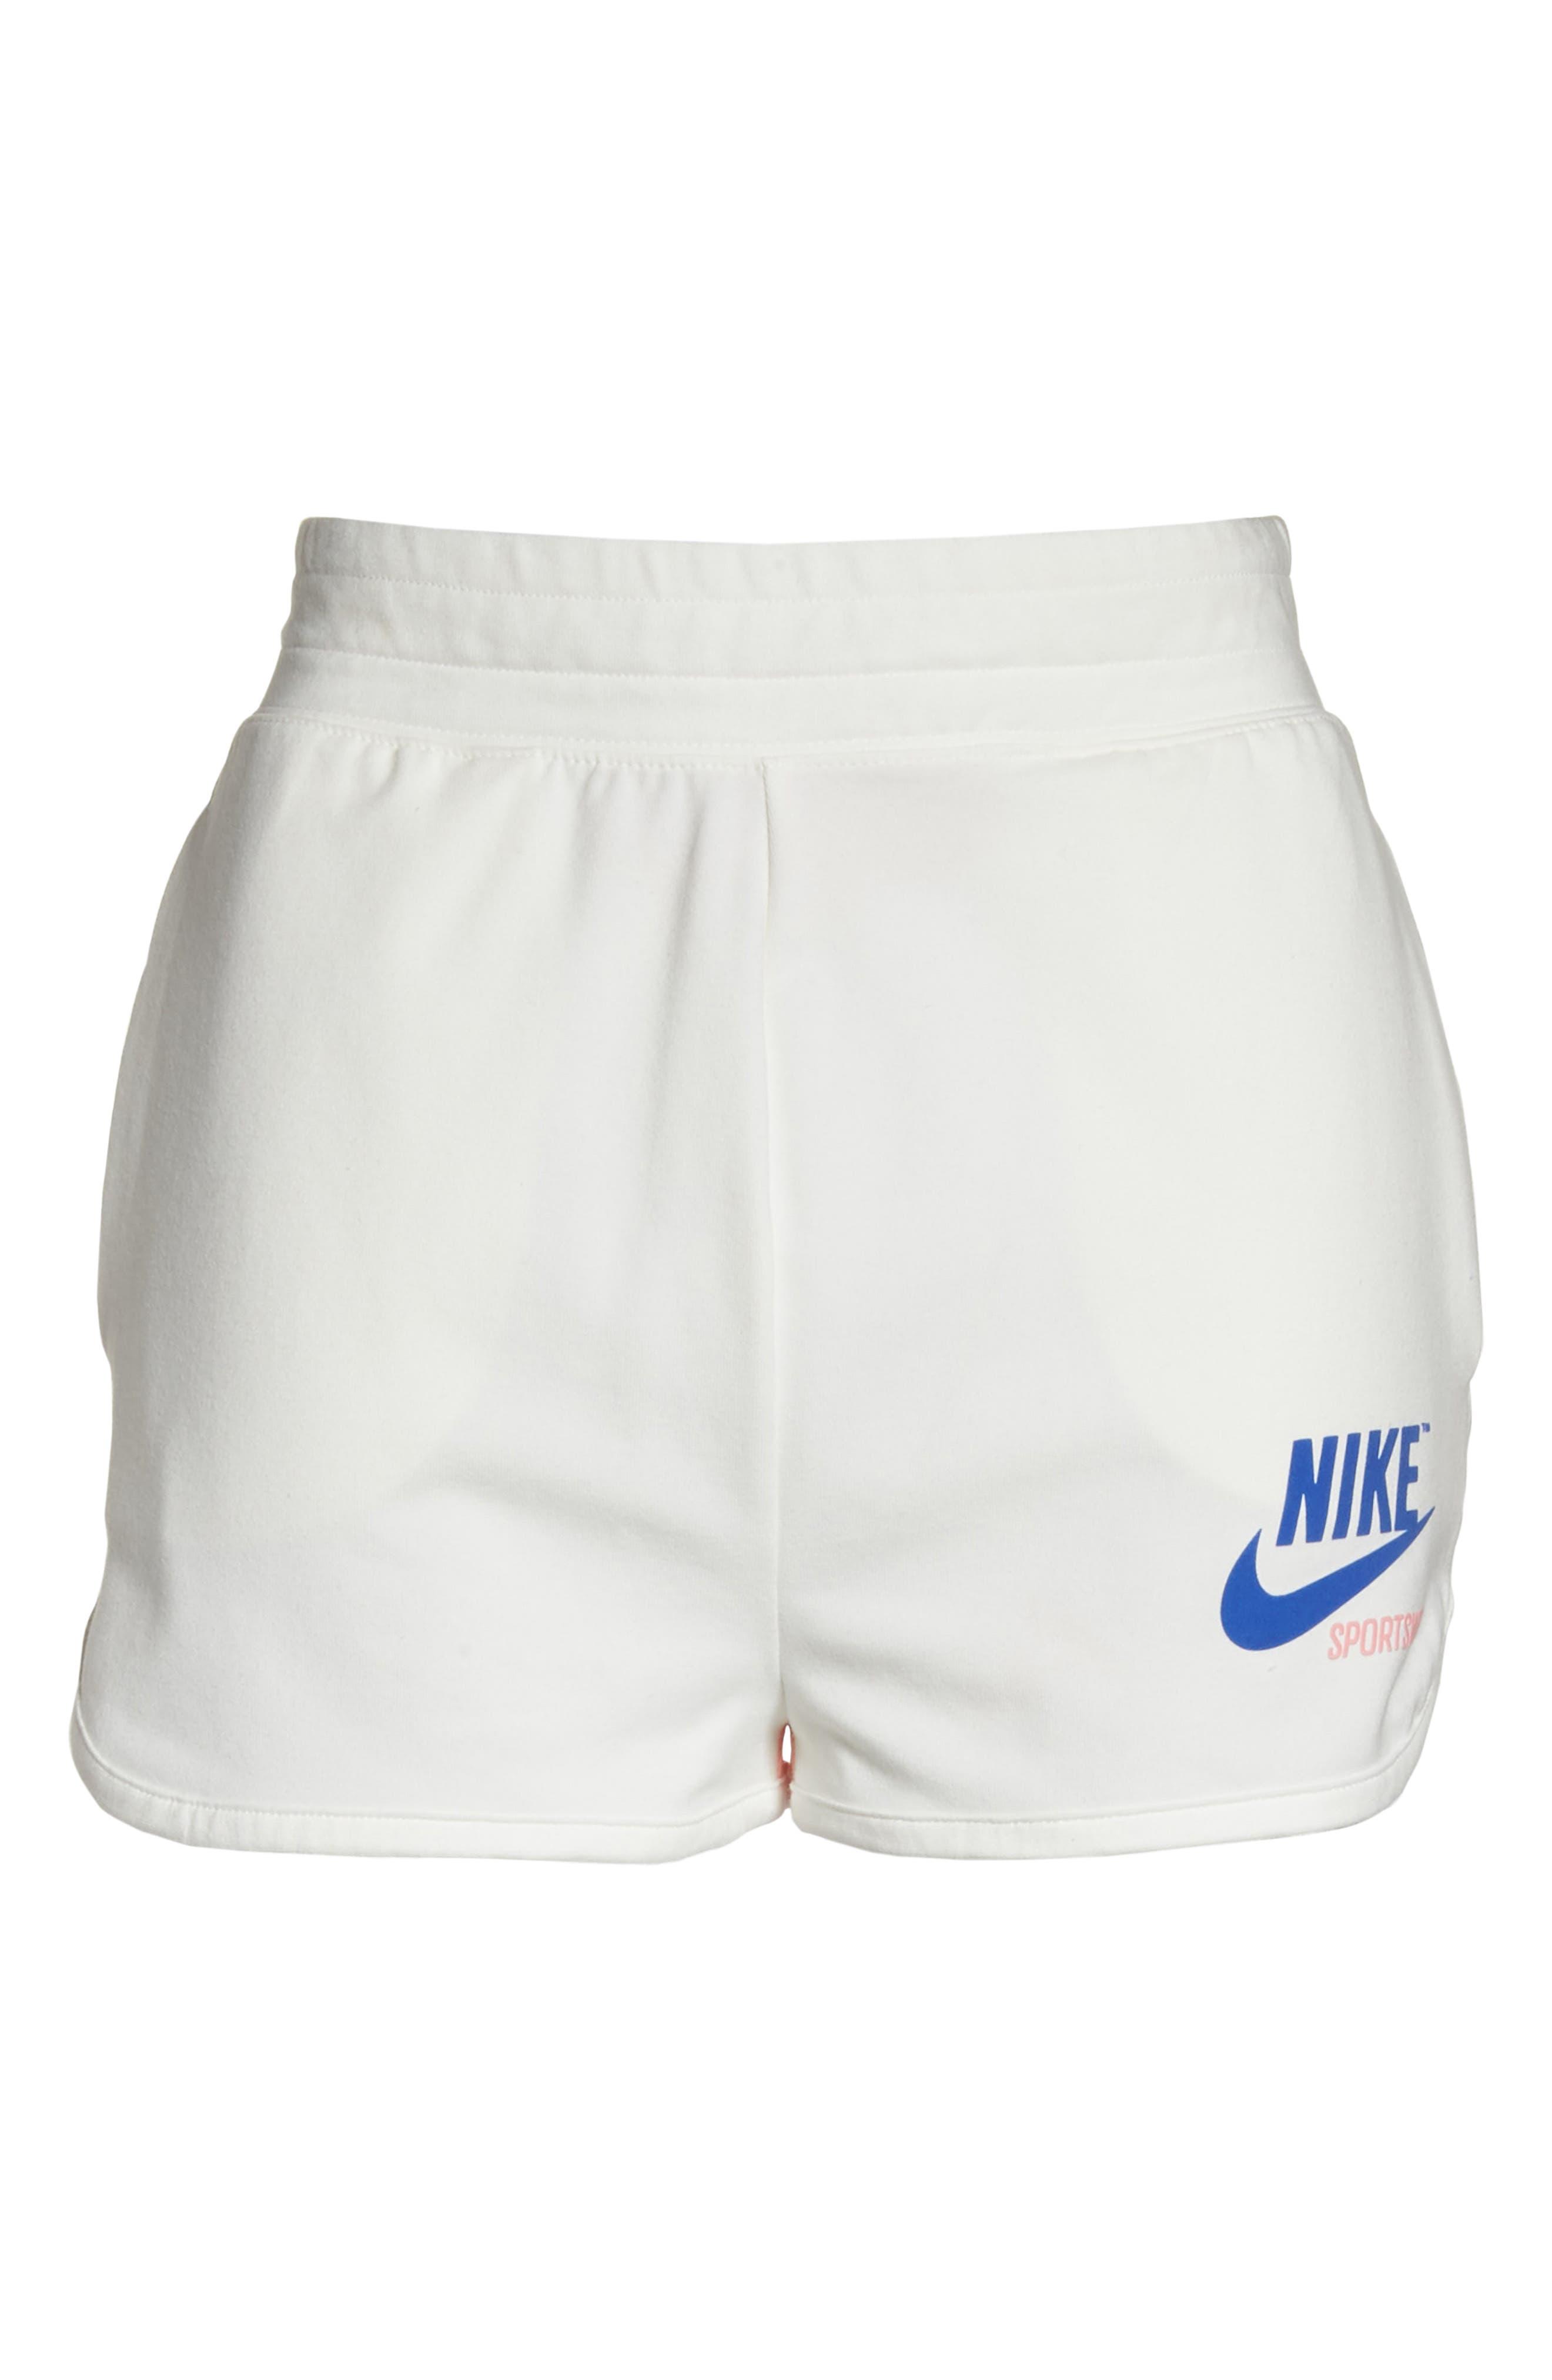 NIKE,                             Sportswear High Waist Archive Shorts,                             Alternate thumbnail 7, color,                             900